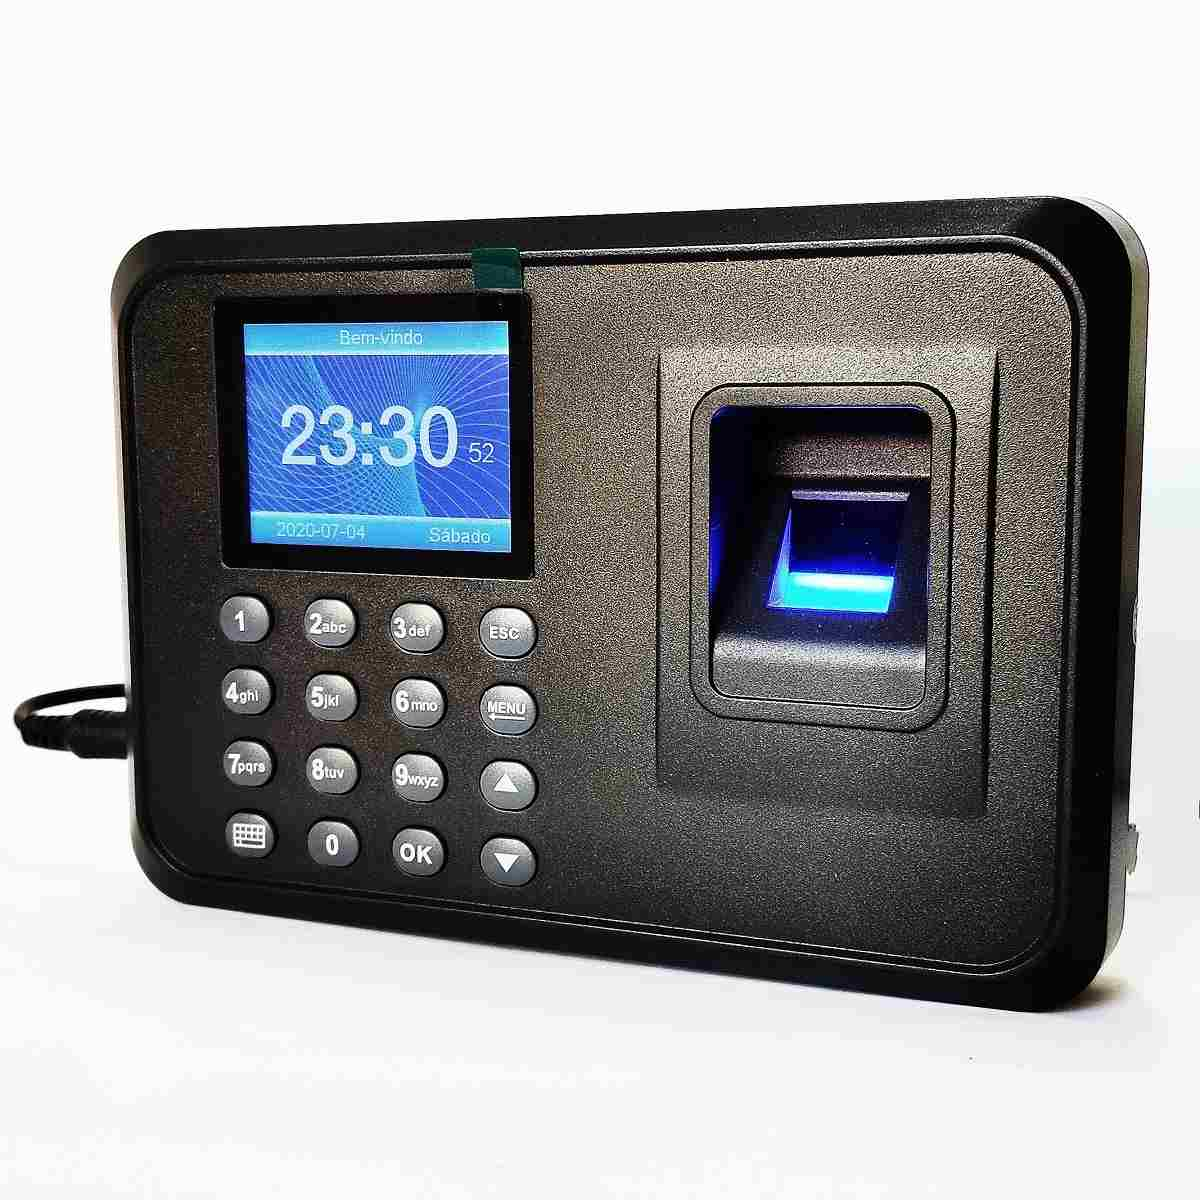 Relógio Ponto Biométrico Impressão Digital Para Empresas Lojas RH-H6